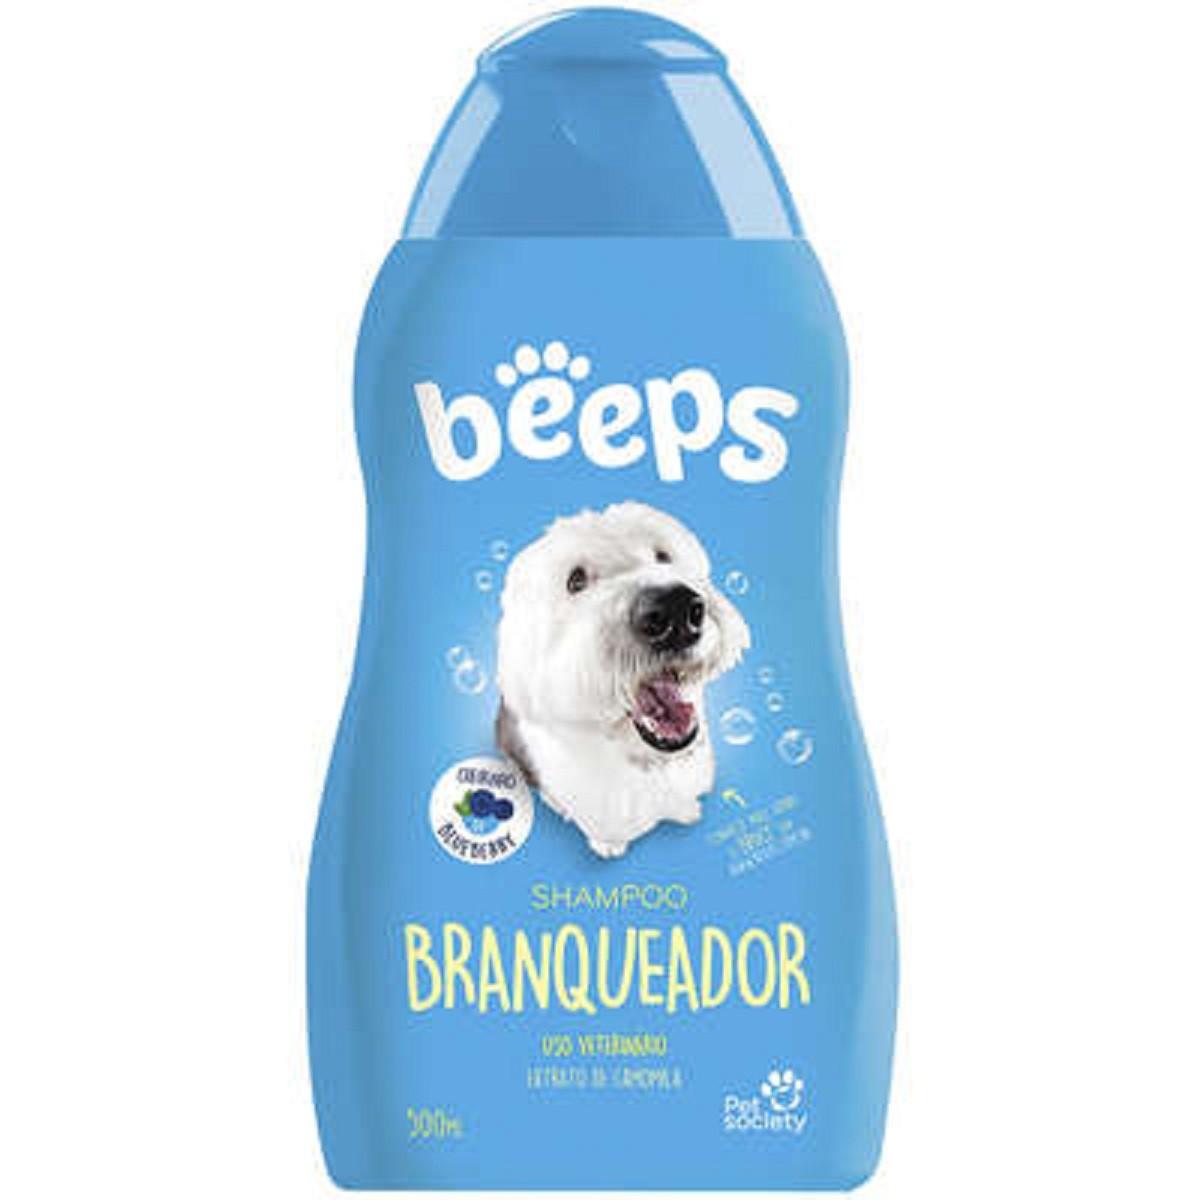 Shampoo Branqueador Shitzu e Condicionador Hidratante Beeps